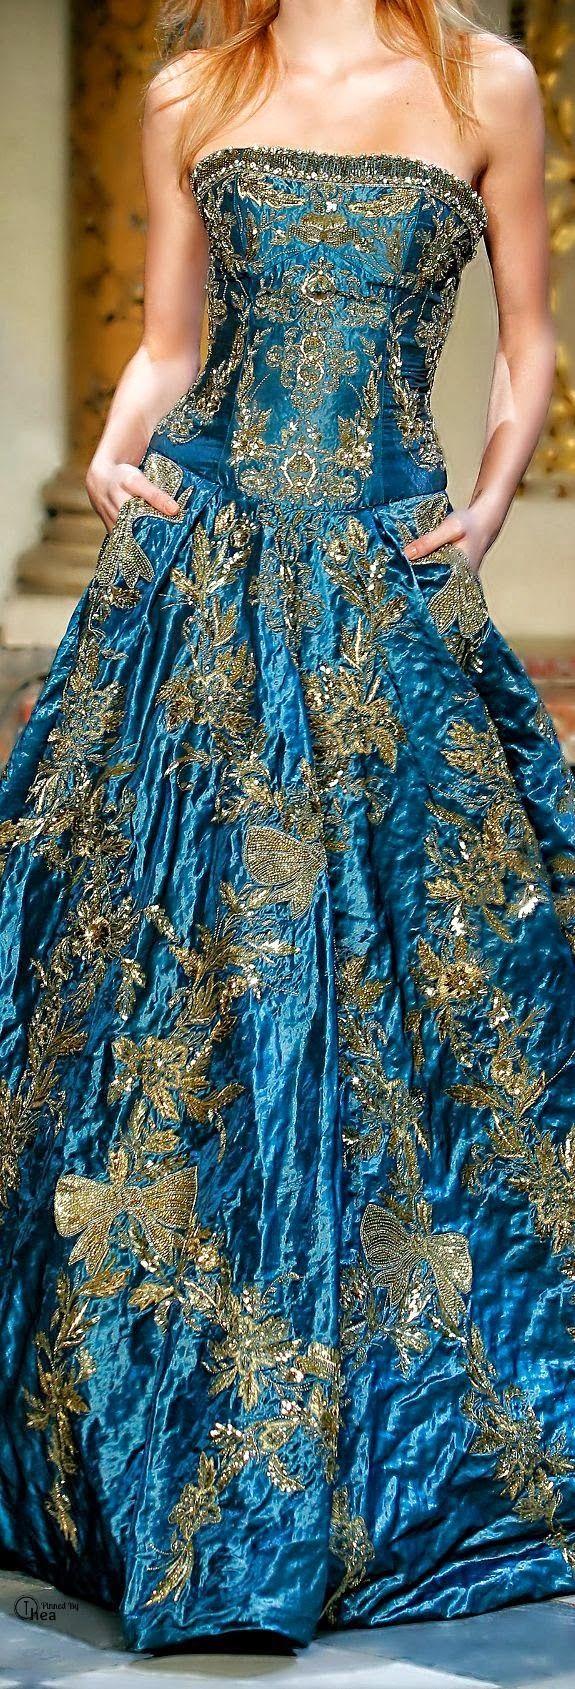 Zuhair Murad. Light blue represented the marriageable woman.